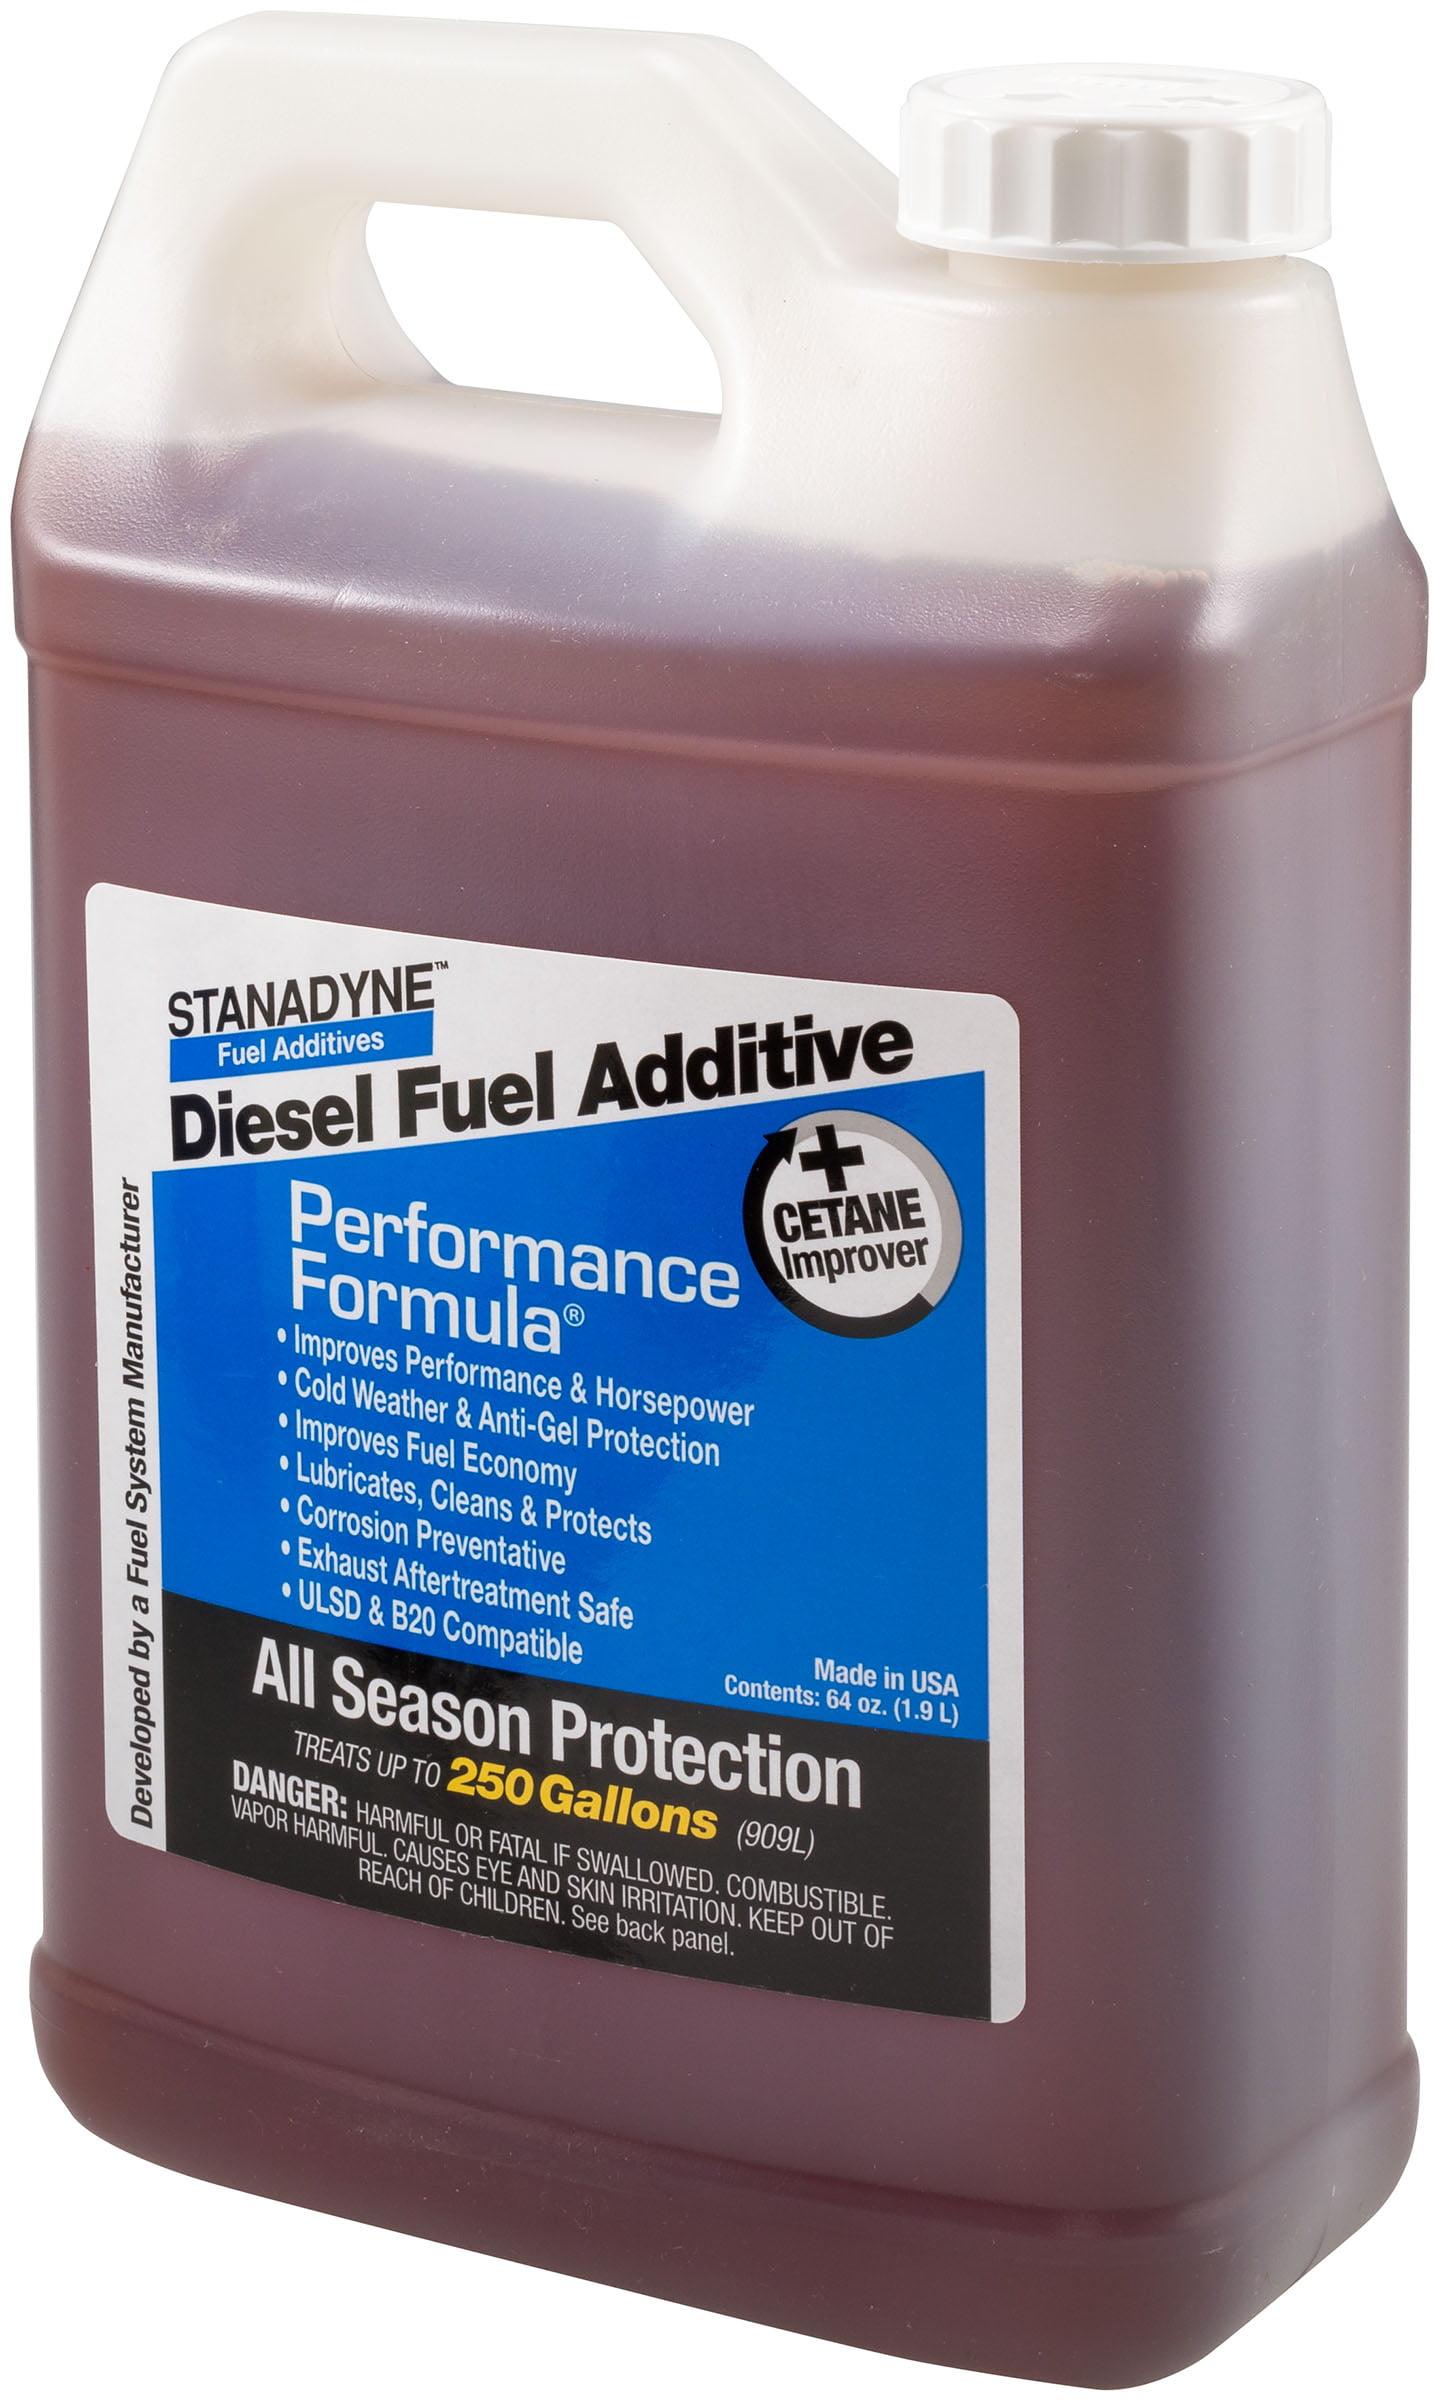 Stanadyne Performance Formula Diesel Fuel Additive 1 2 Gallon Stanadyne 38566 Walmart Com Walmart Com